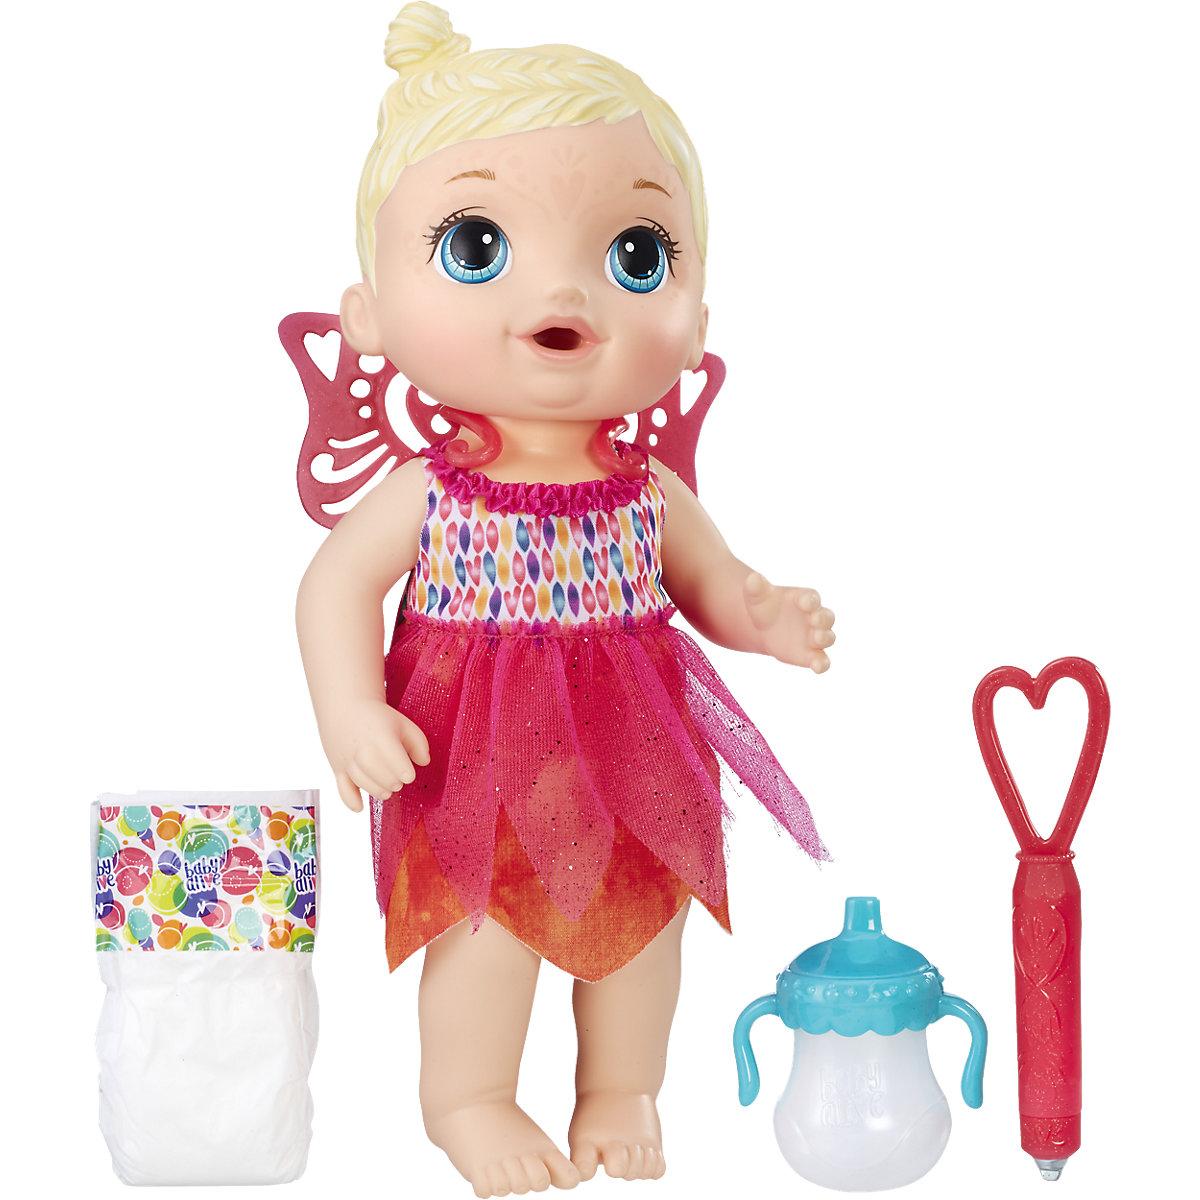 Hasbro Baby Alive blonďatá panenka s plenky a lahvičkou